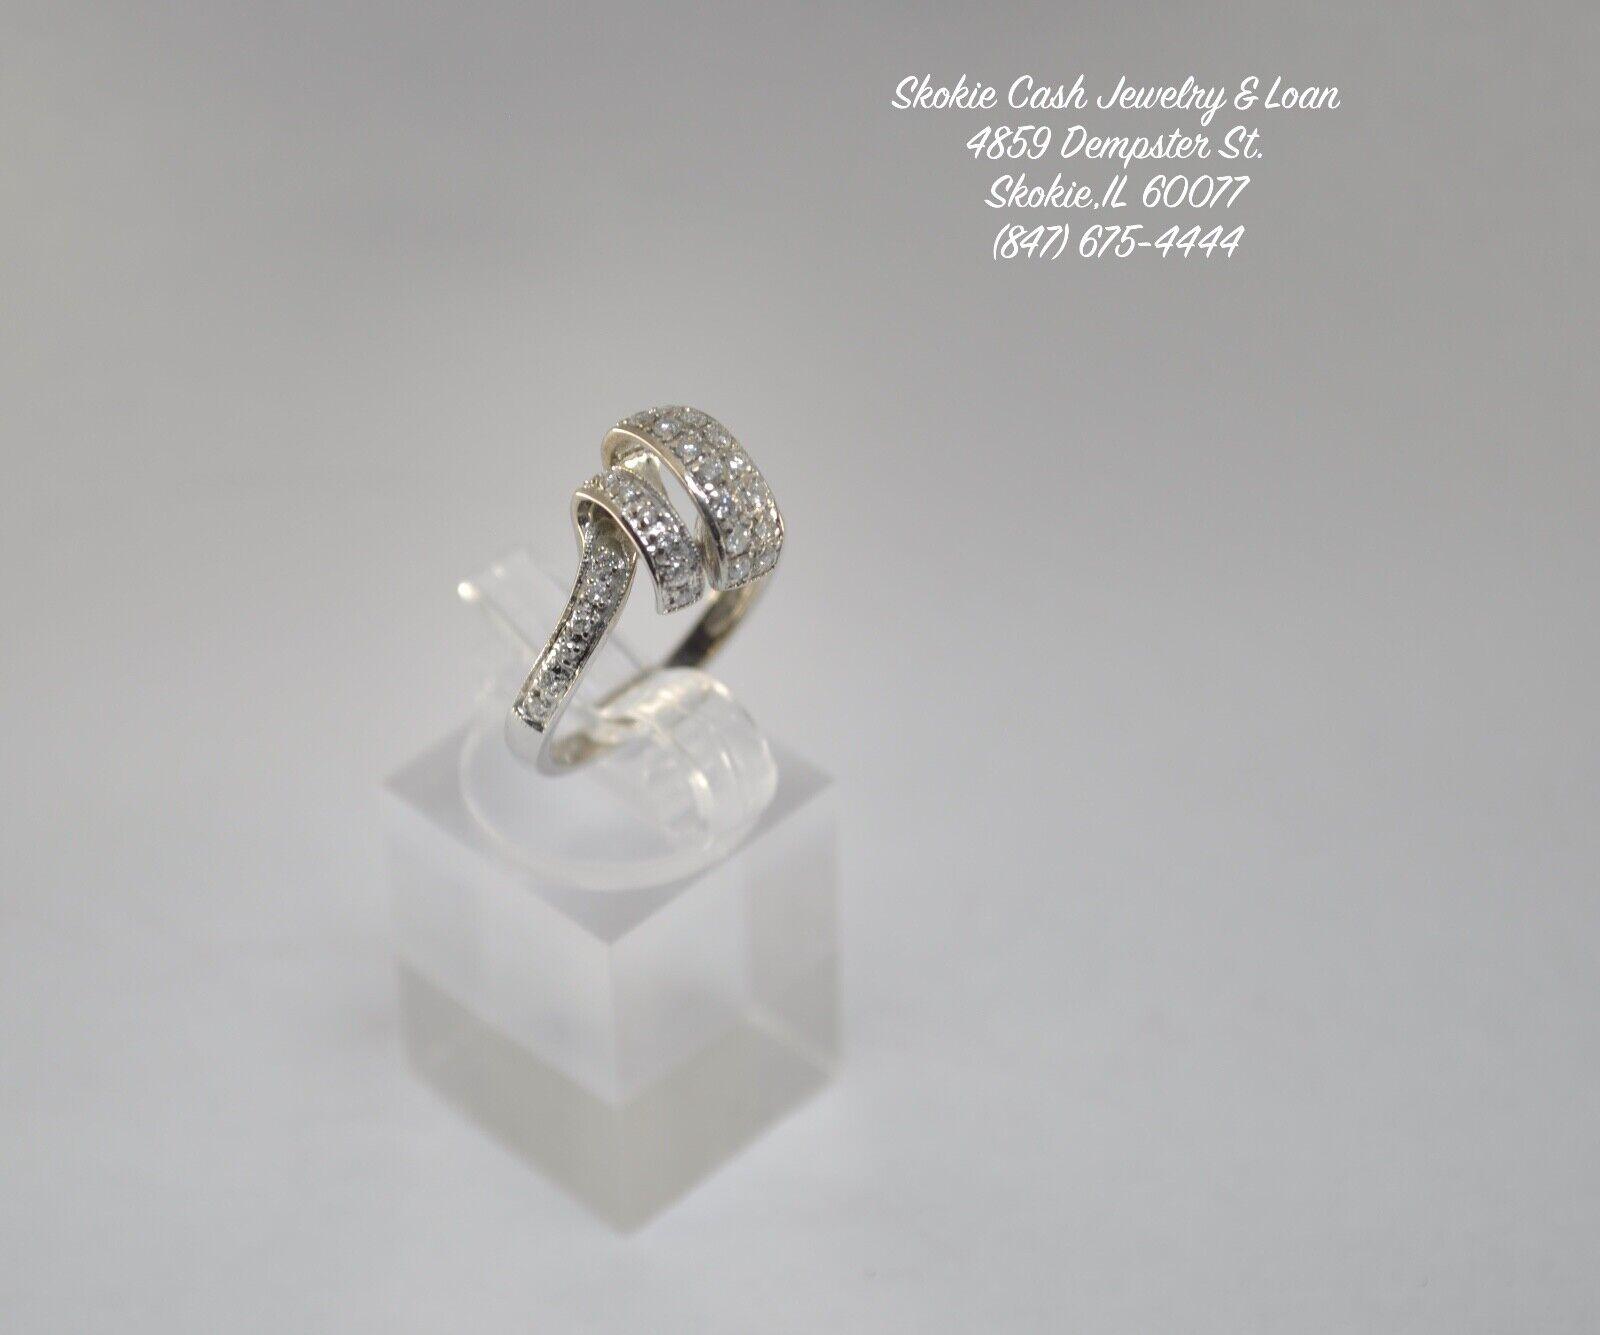 14kt White gold Diamond Knot Ring (TCW  0.50)